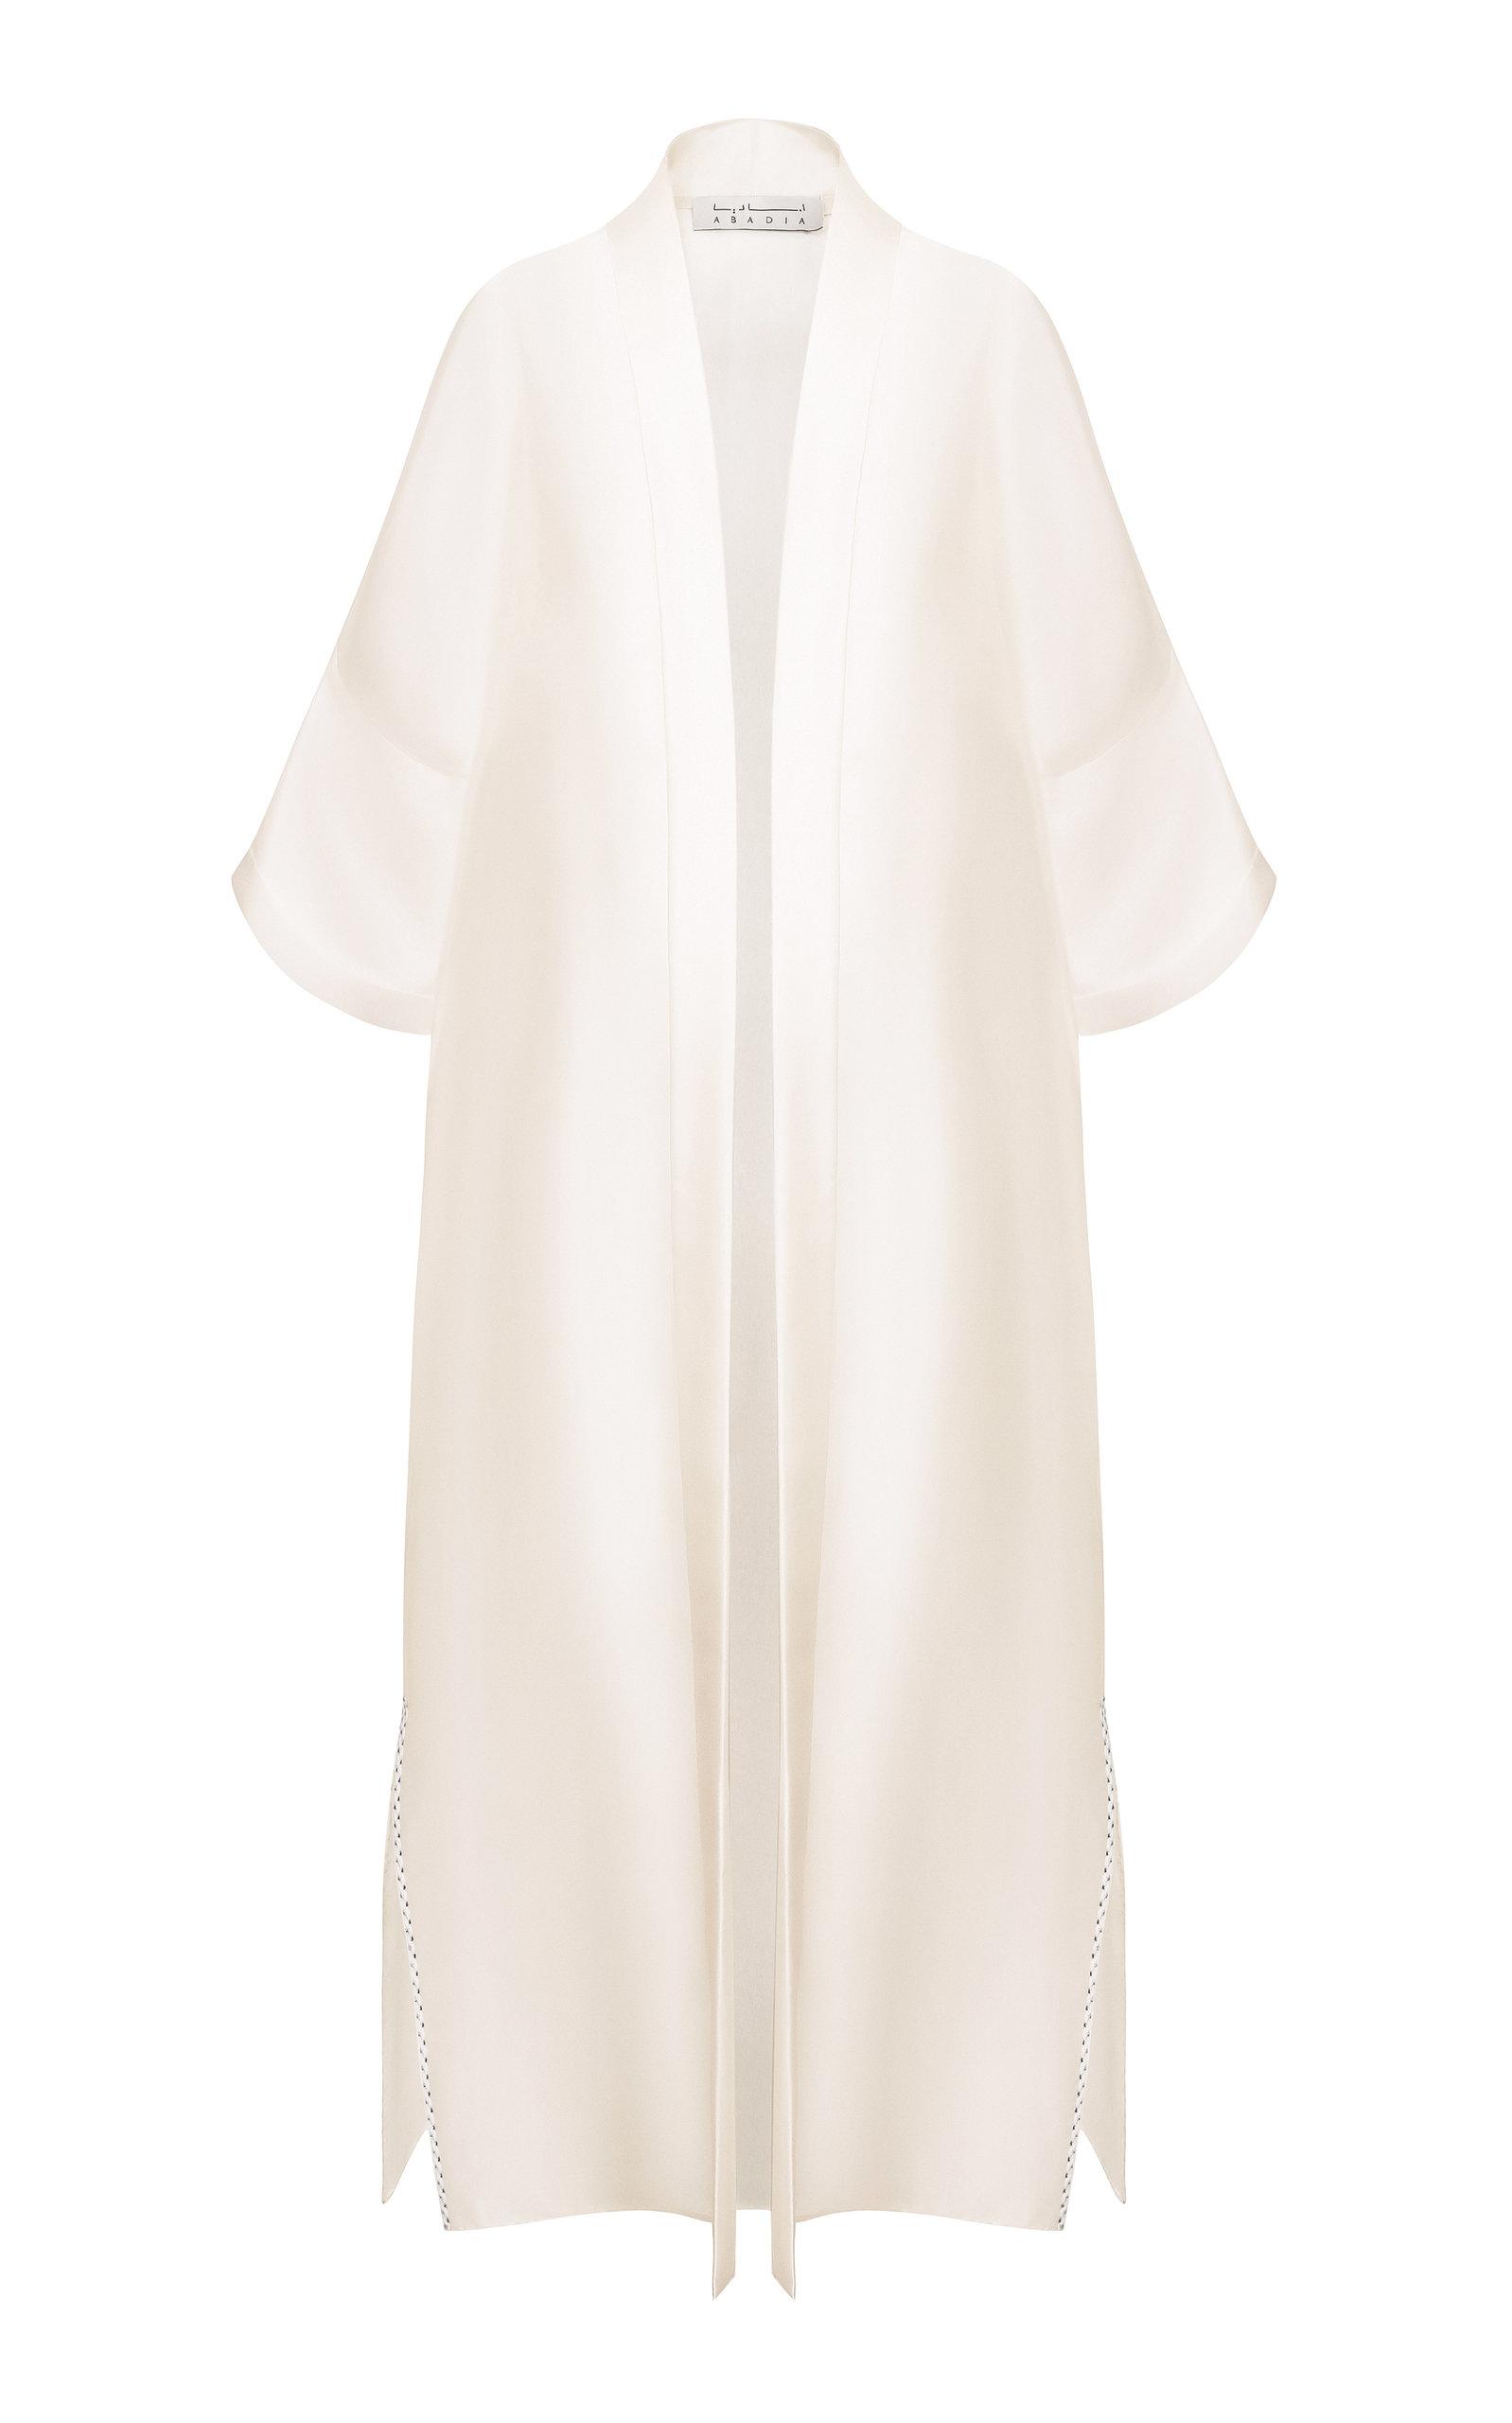 ABADIA Oversized Silk Organza Cardigan in White